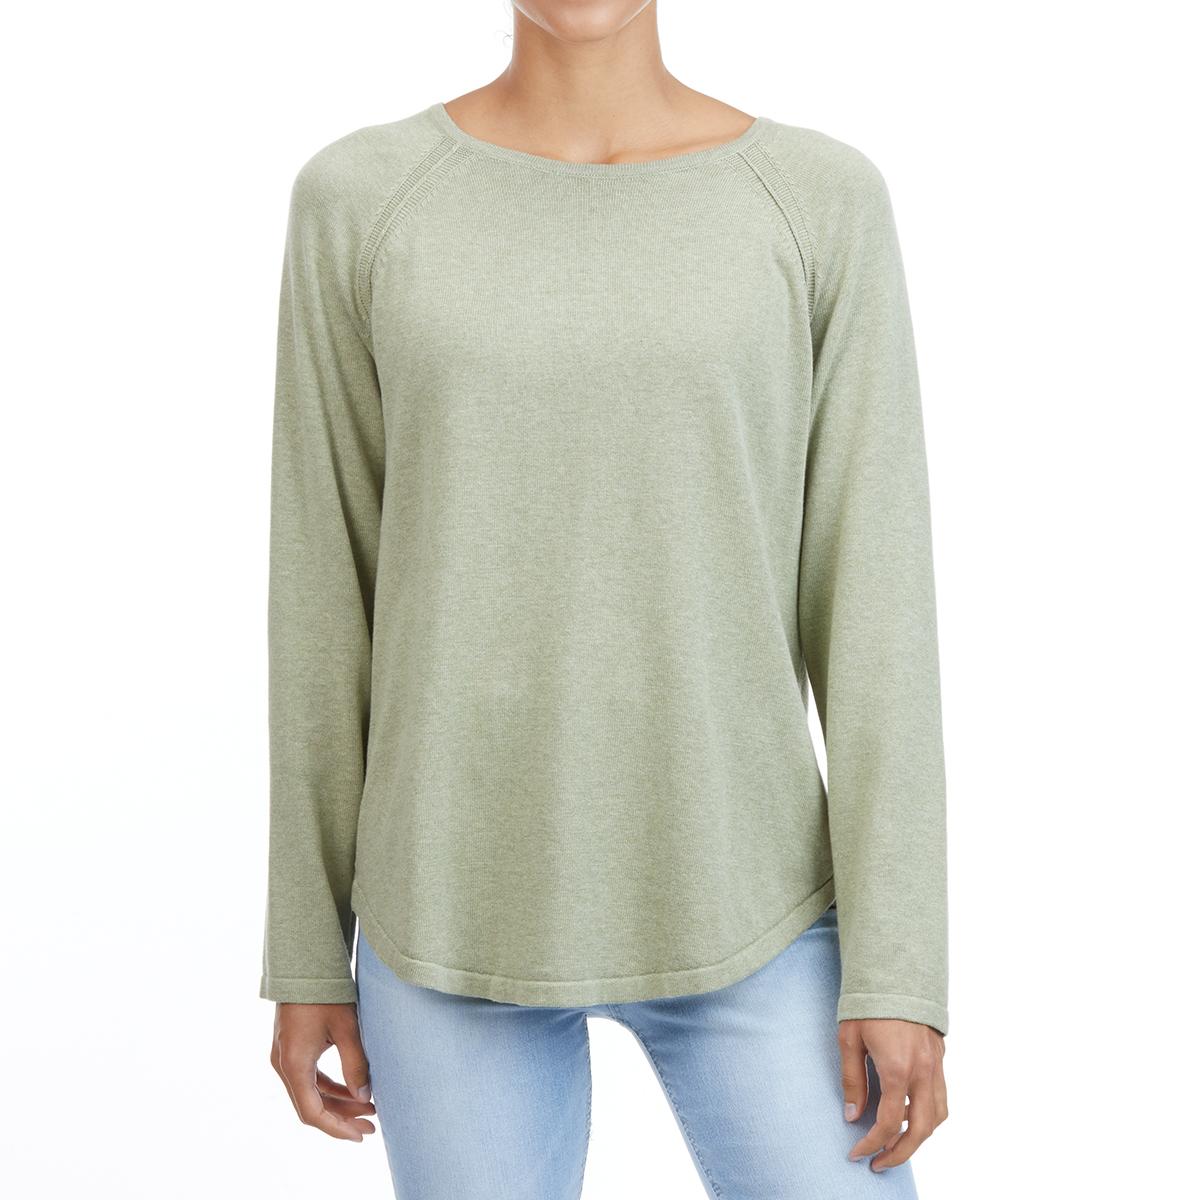 Jeanne Pierre Women's Cotton Crew Shirttail Sweater - Green, L